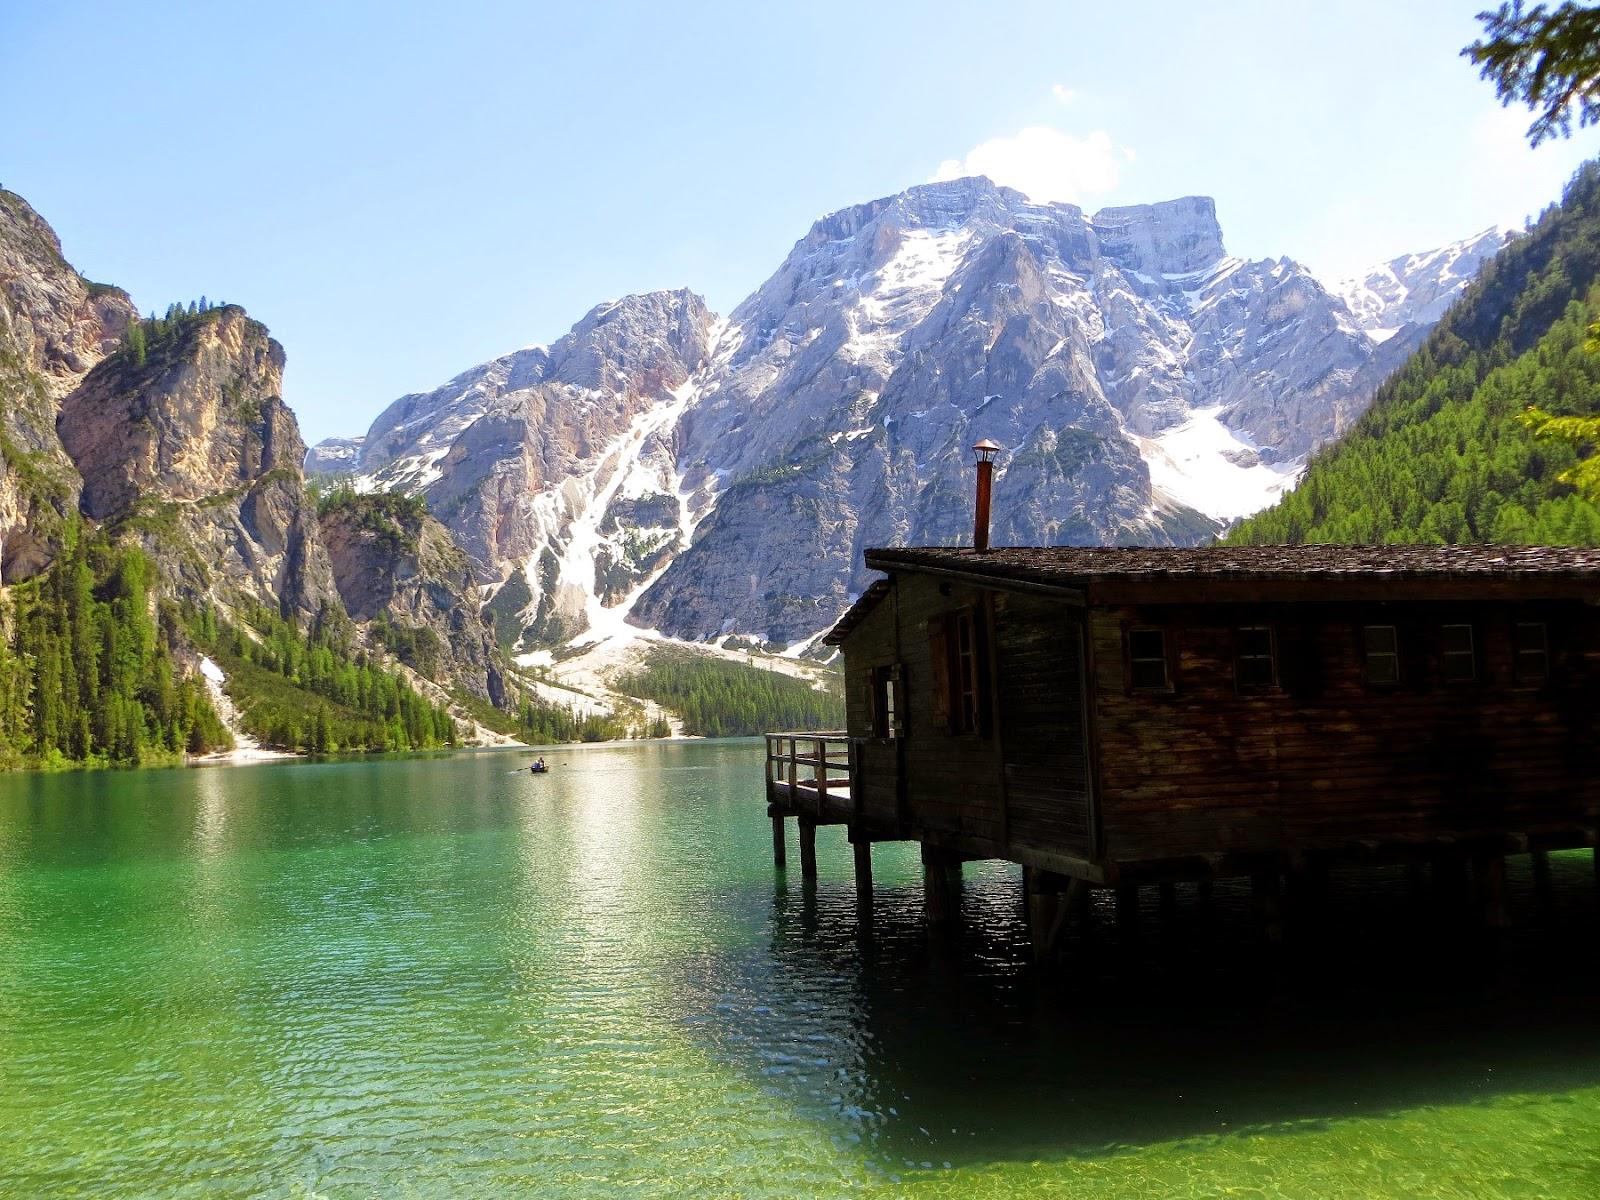 escursione trekking al lago di braies